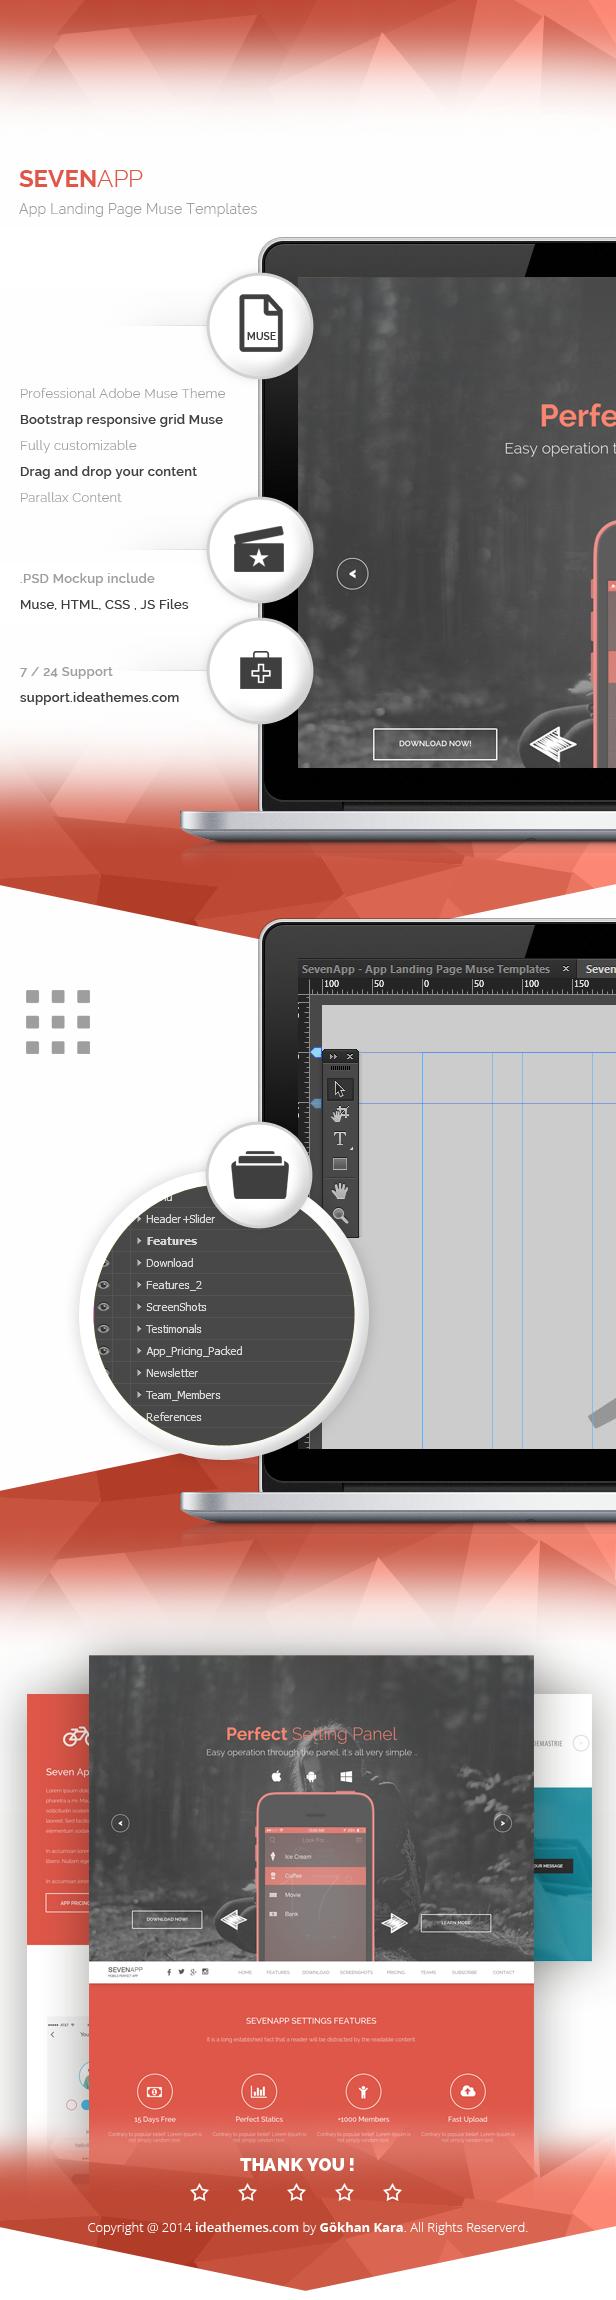 SevenApp - App Landing Page Muse Templates - 2